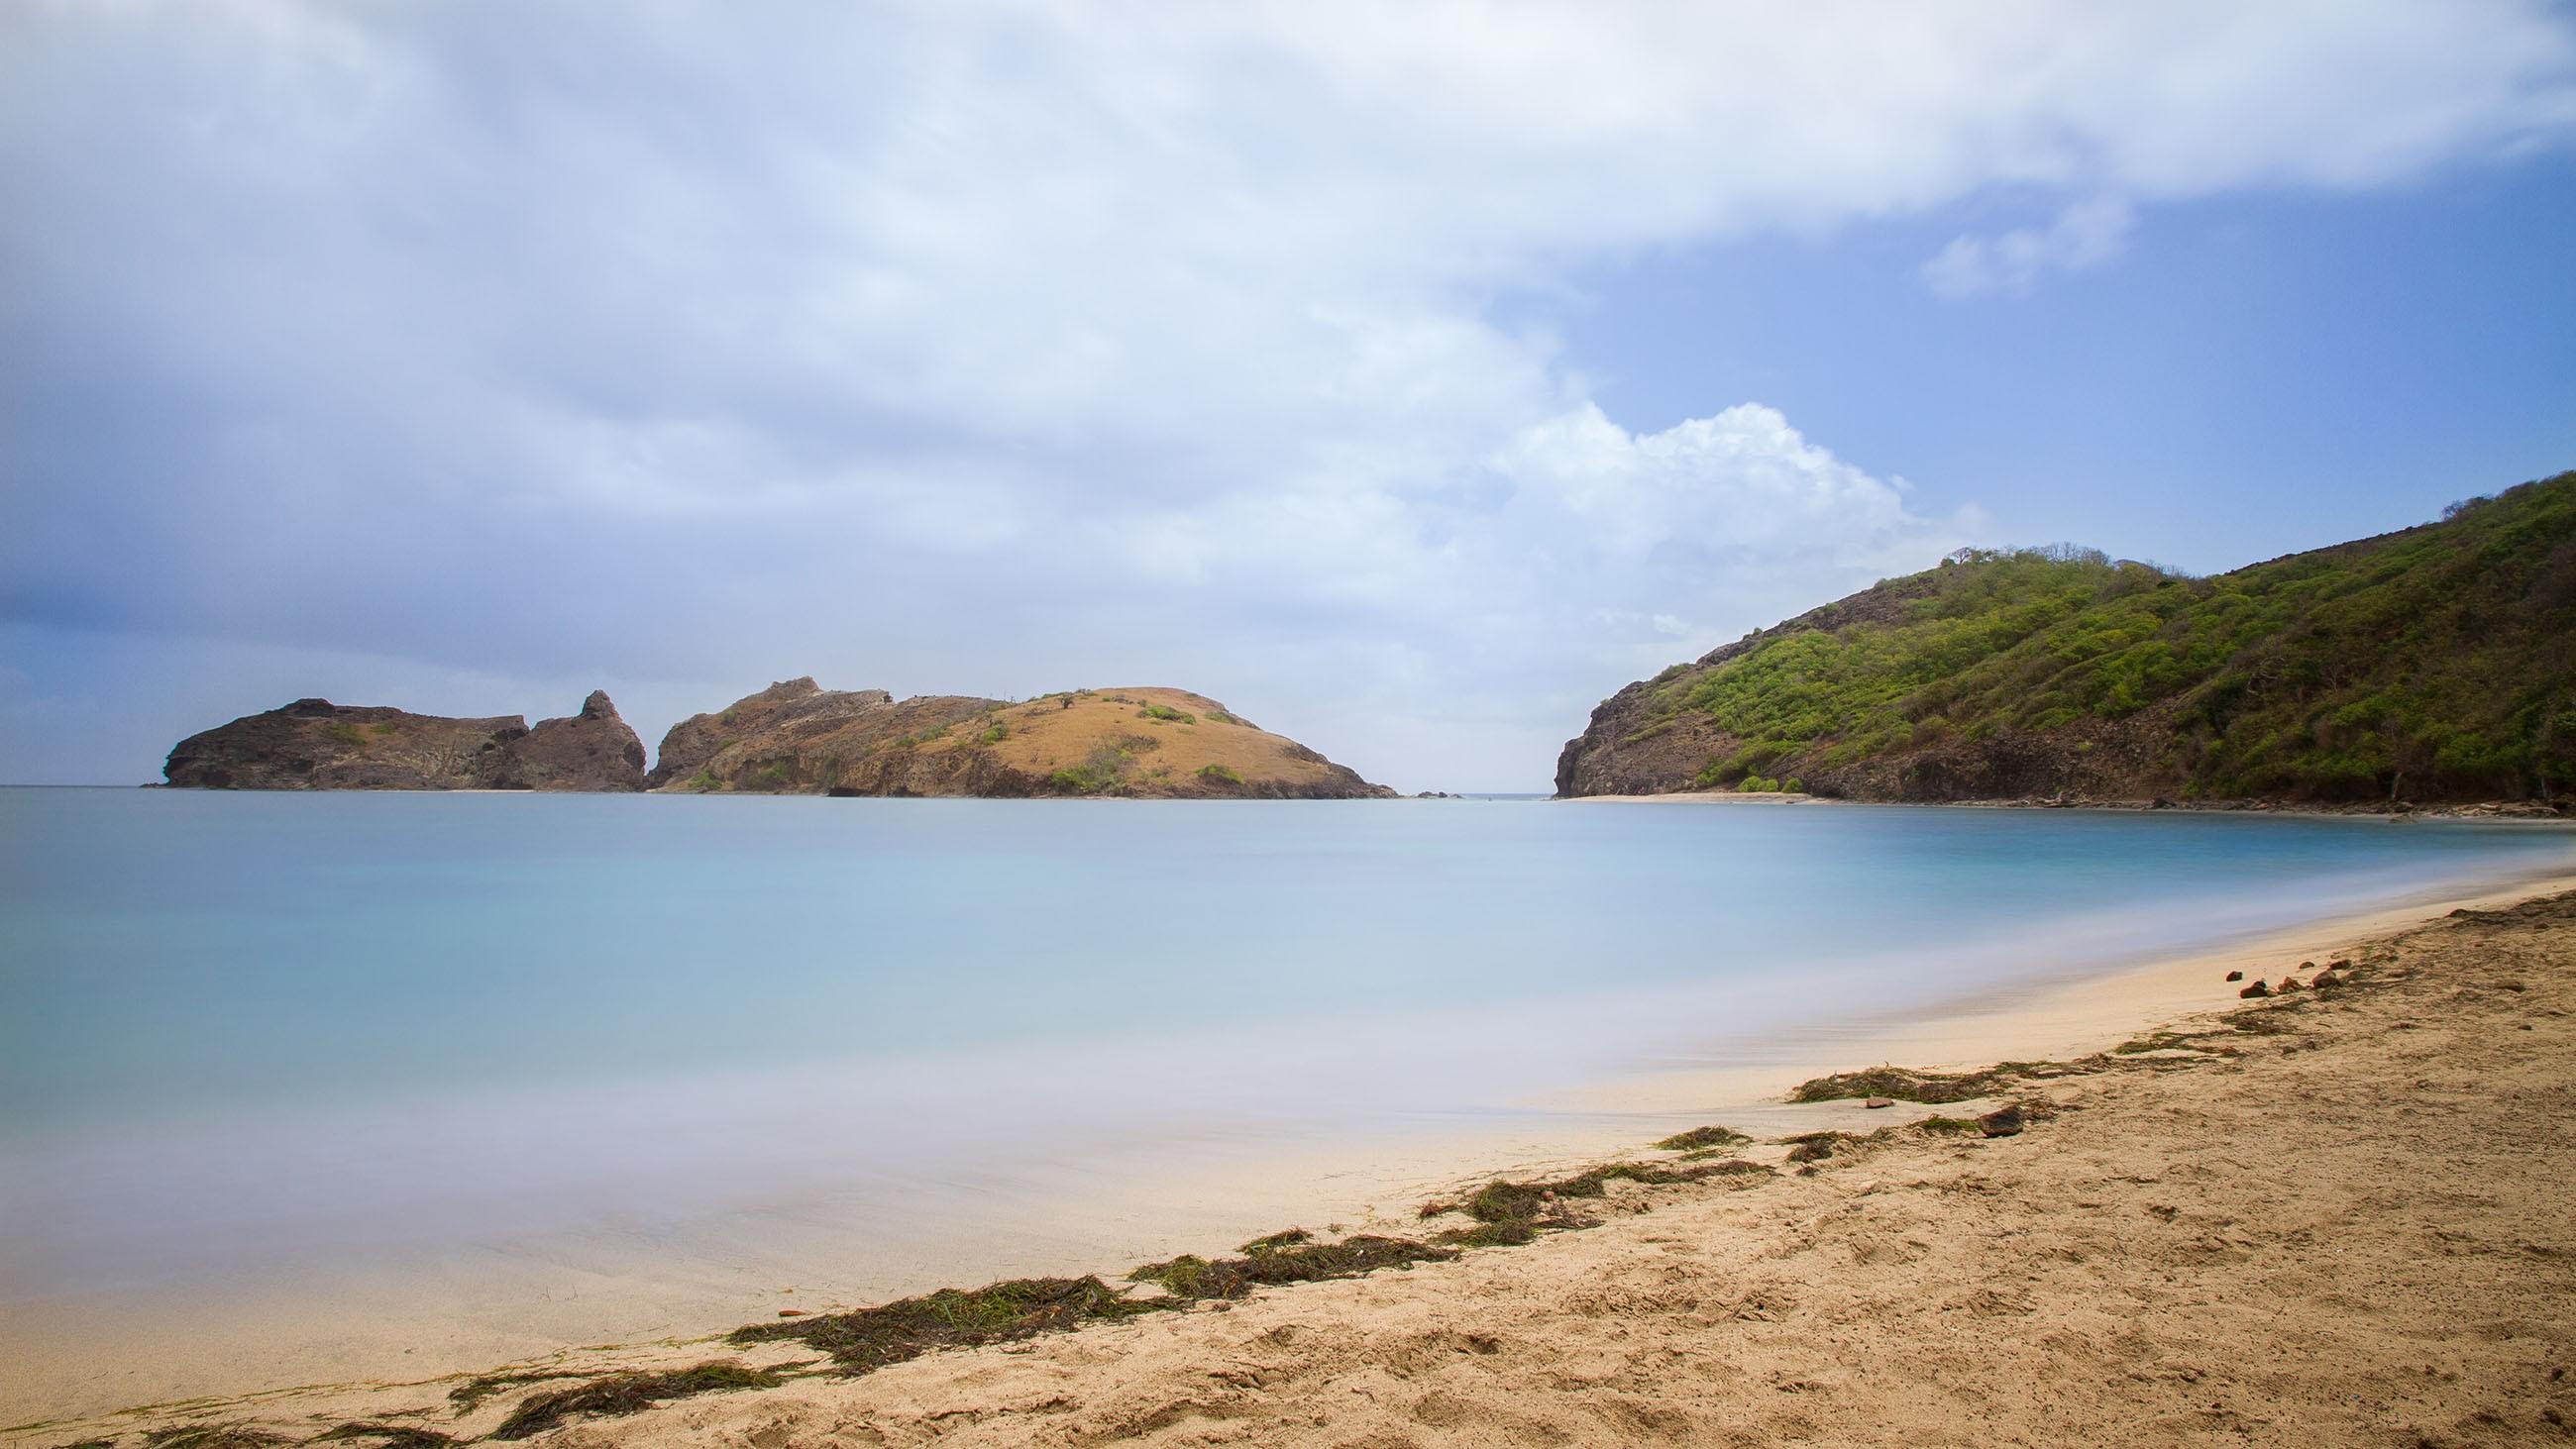 beach-lessaintes-guadeloupe-france-paradise-island-caribbean-nobody